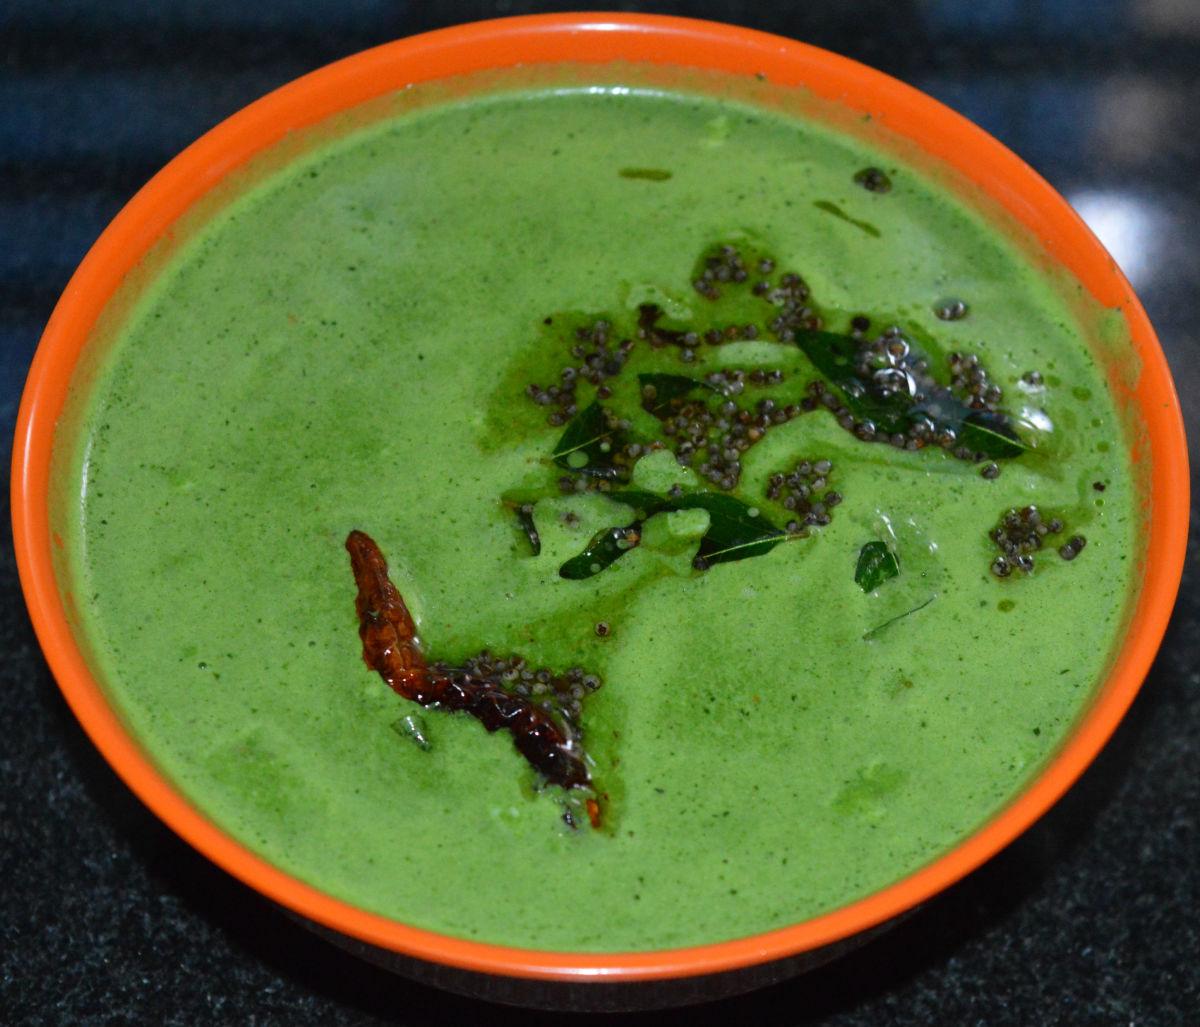 Leafy Vegetable Tambli (Leafy-Greens Drink)